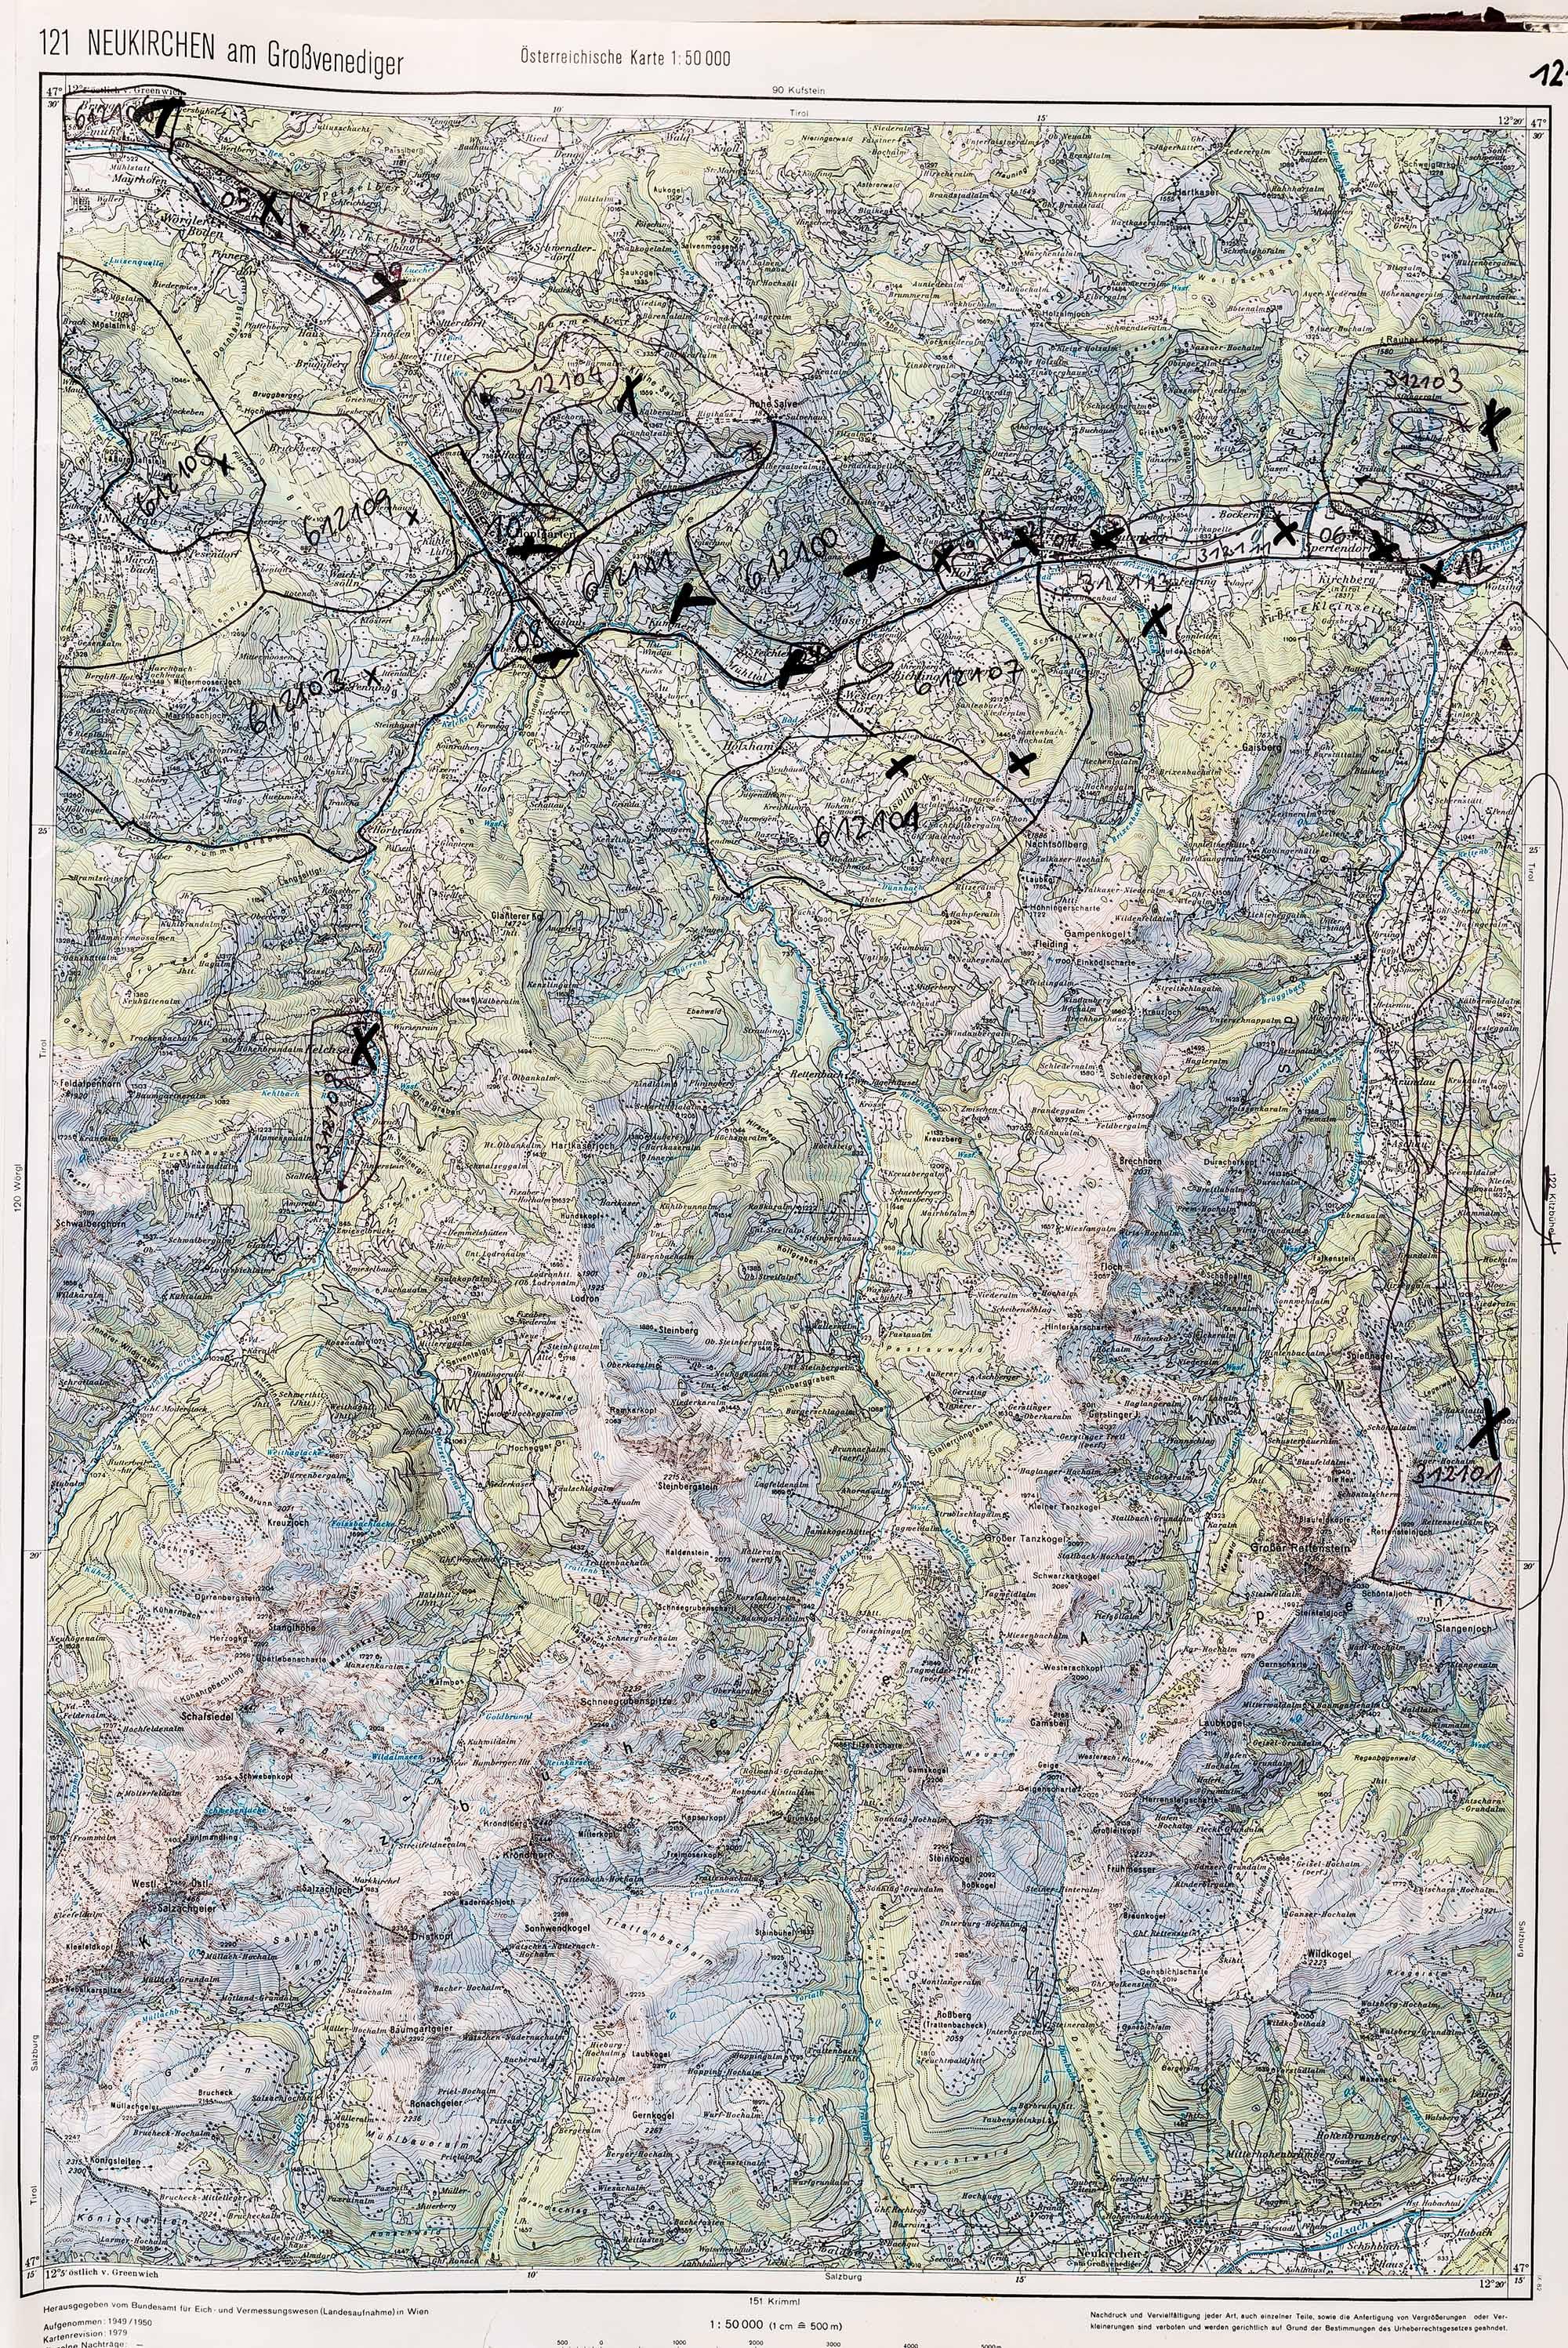 1983-1986 Karte 121